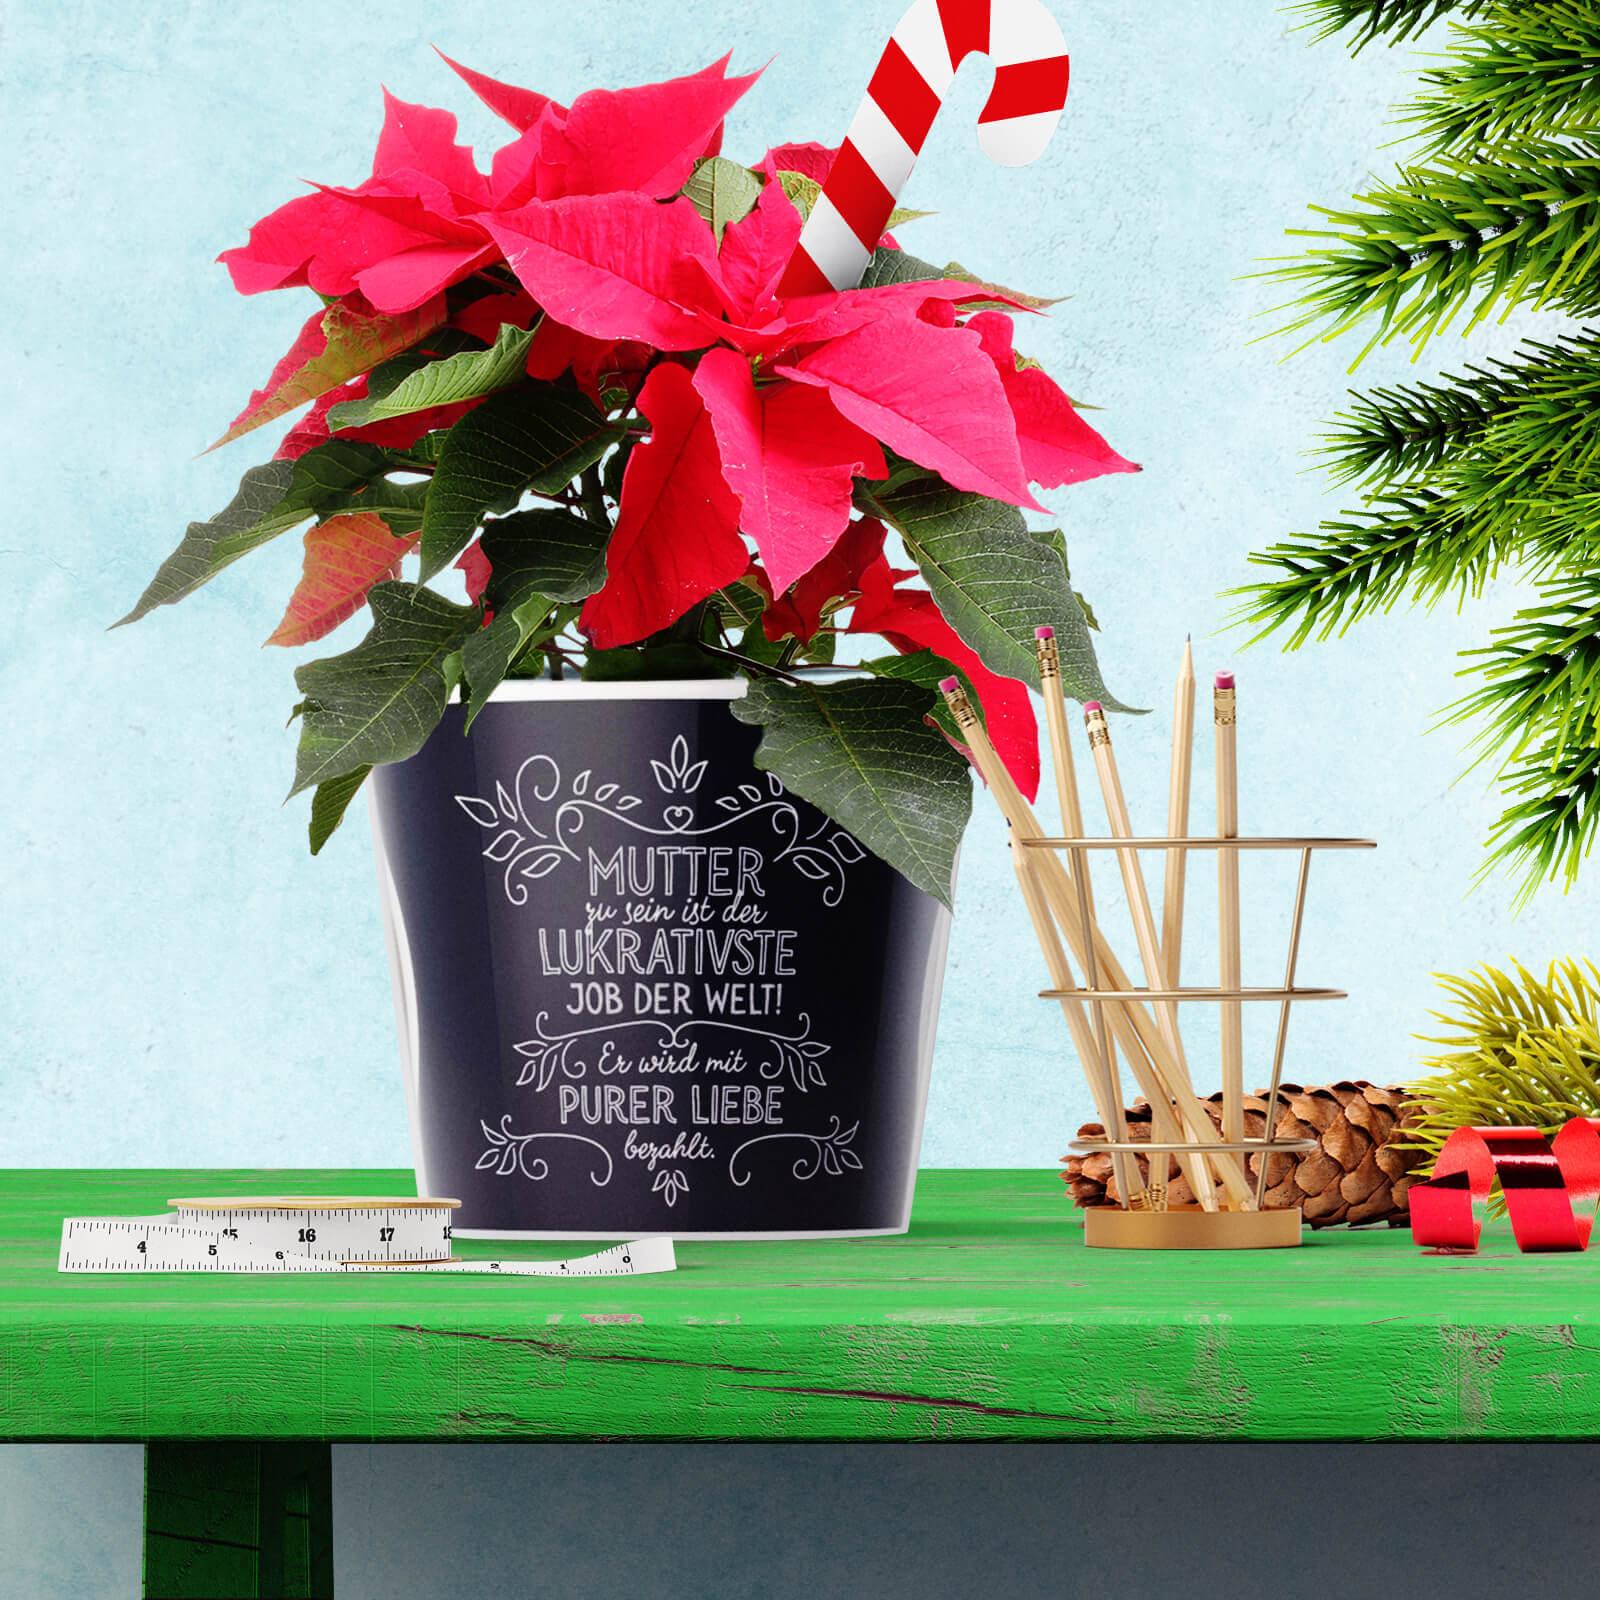 geschenke f r mama 8 coole ideen zu weihnachten myfacepot. Black Bedroom Furniture Sets. Home Design Ideas